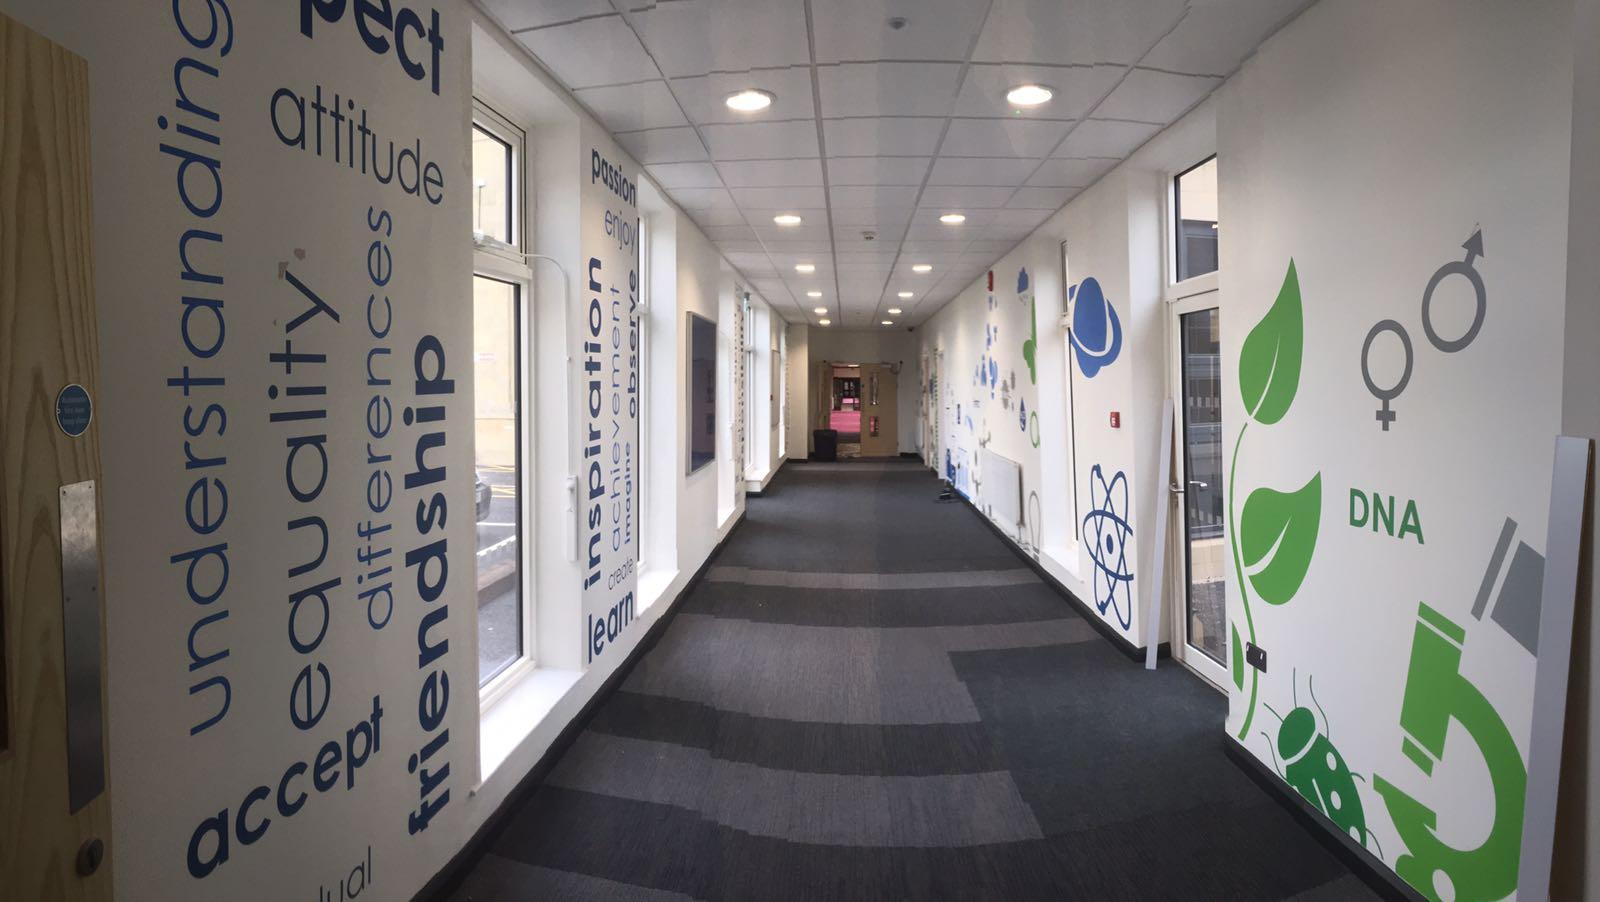 School interior graphics